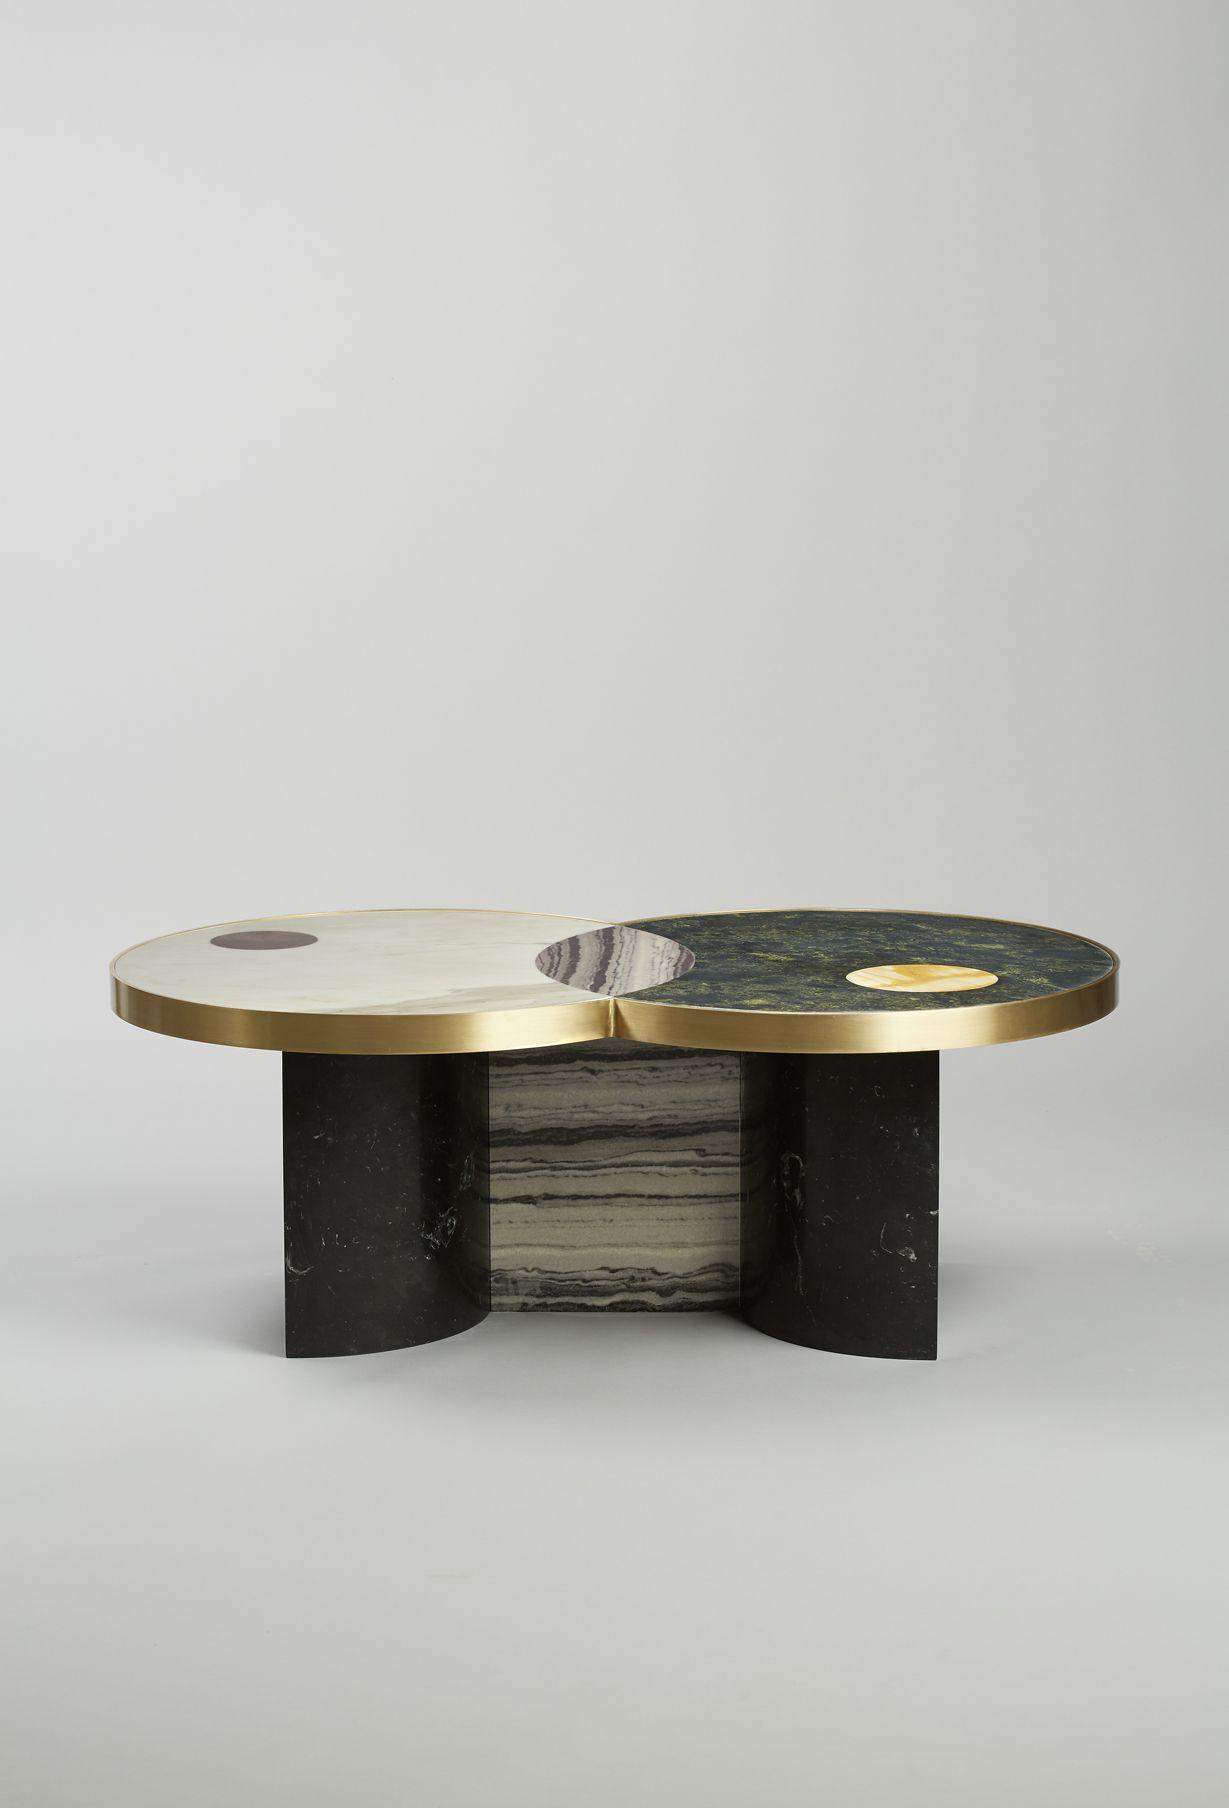 The Lunar Collection Designed By Lara Bohinc For Lapicida